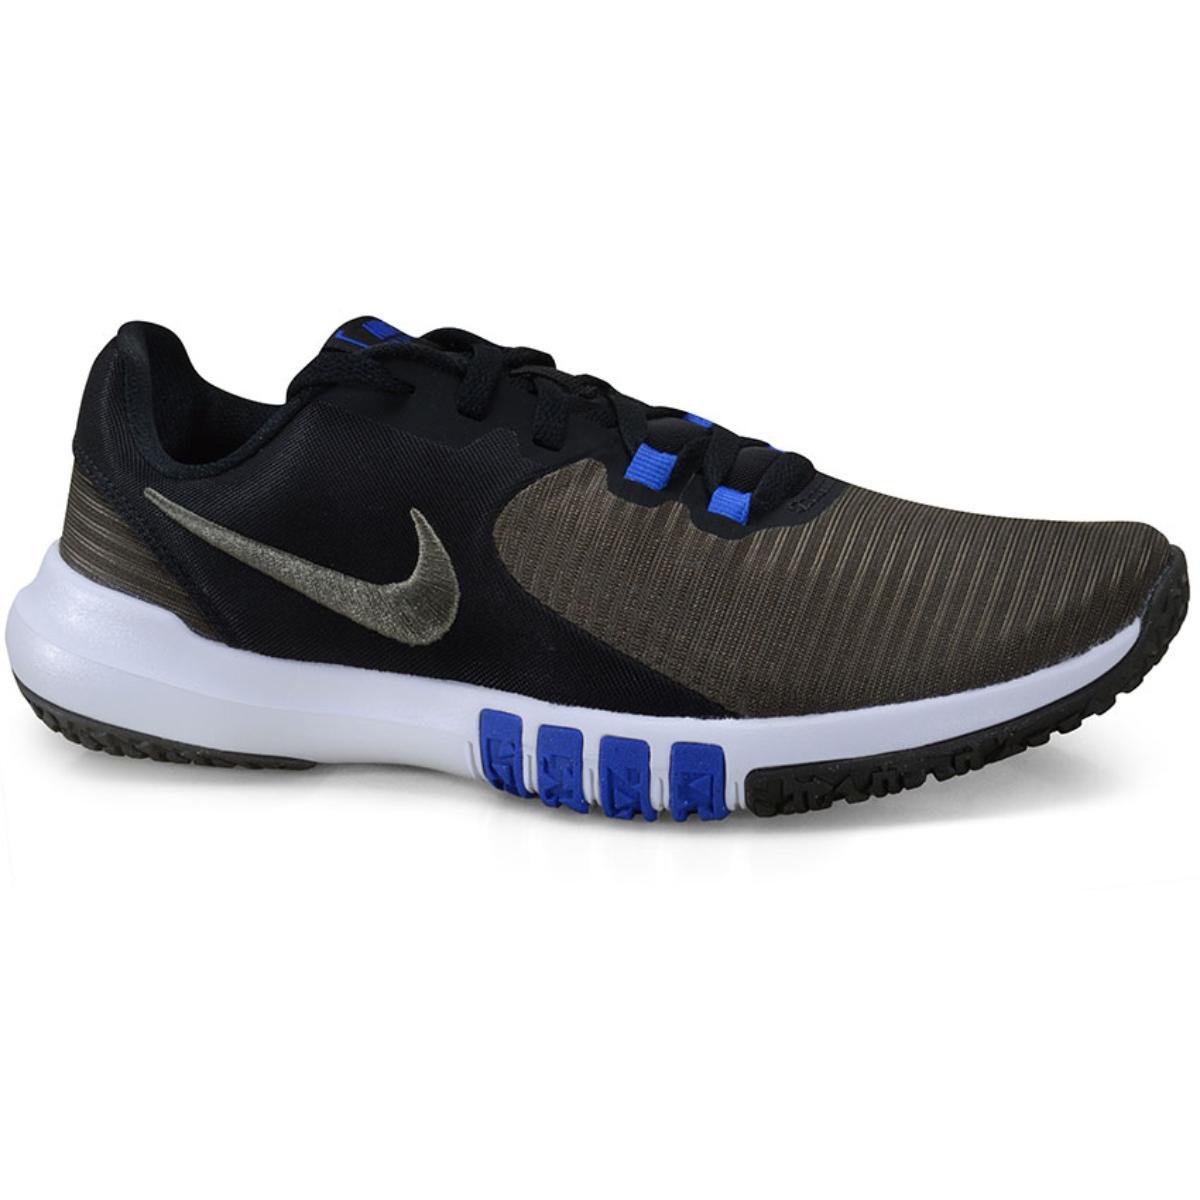 Tênis Masculino Nike Cd0197-008 Flex Control Tr4 Preto/musgo/azul